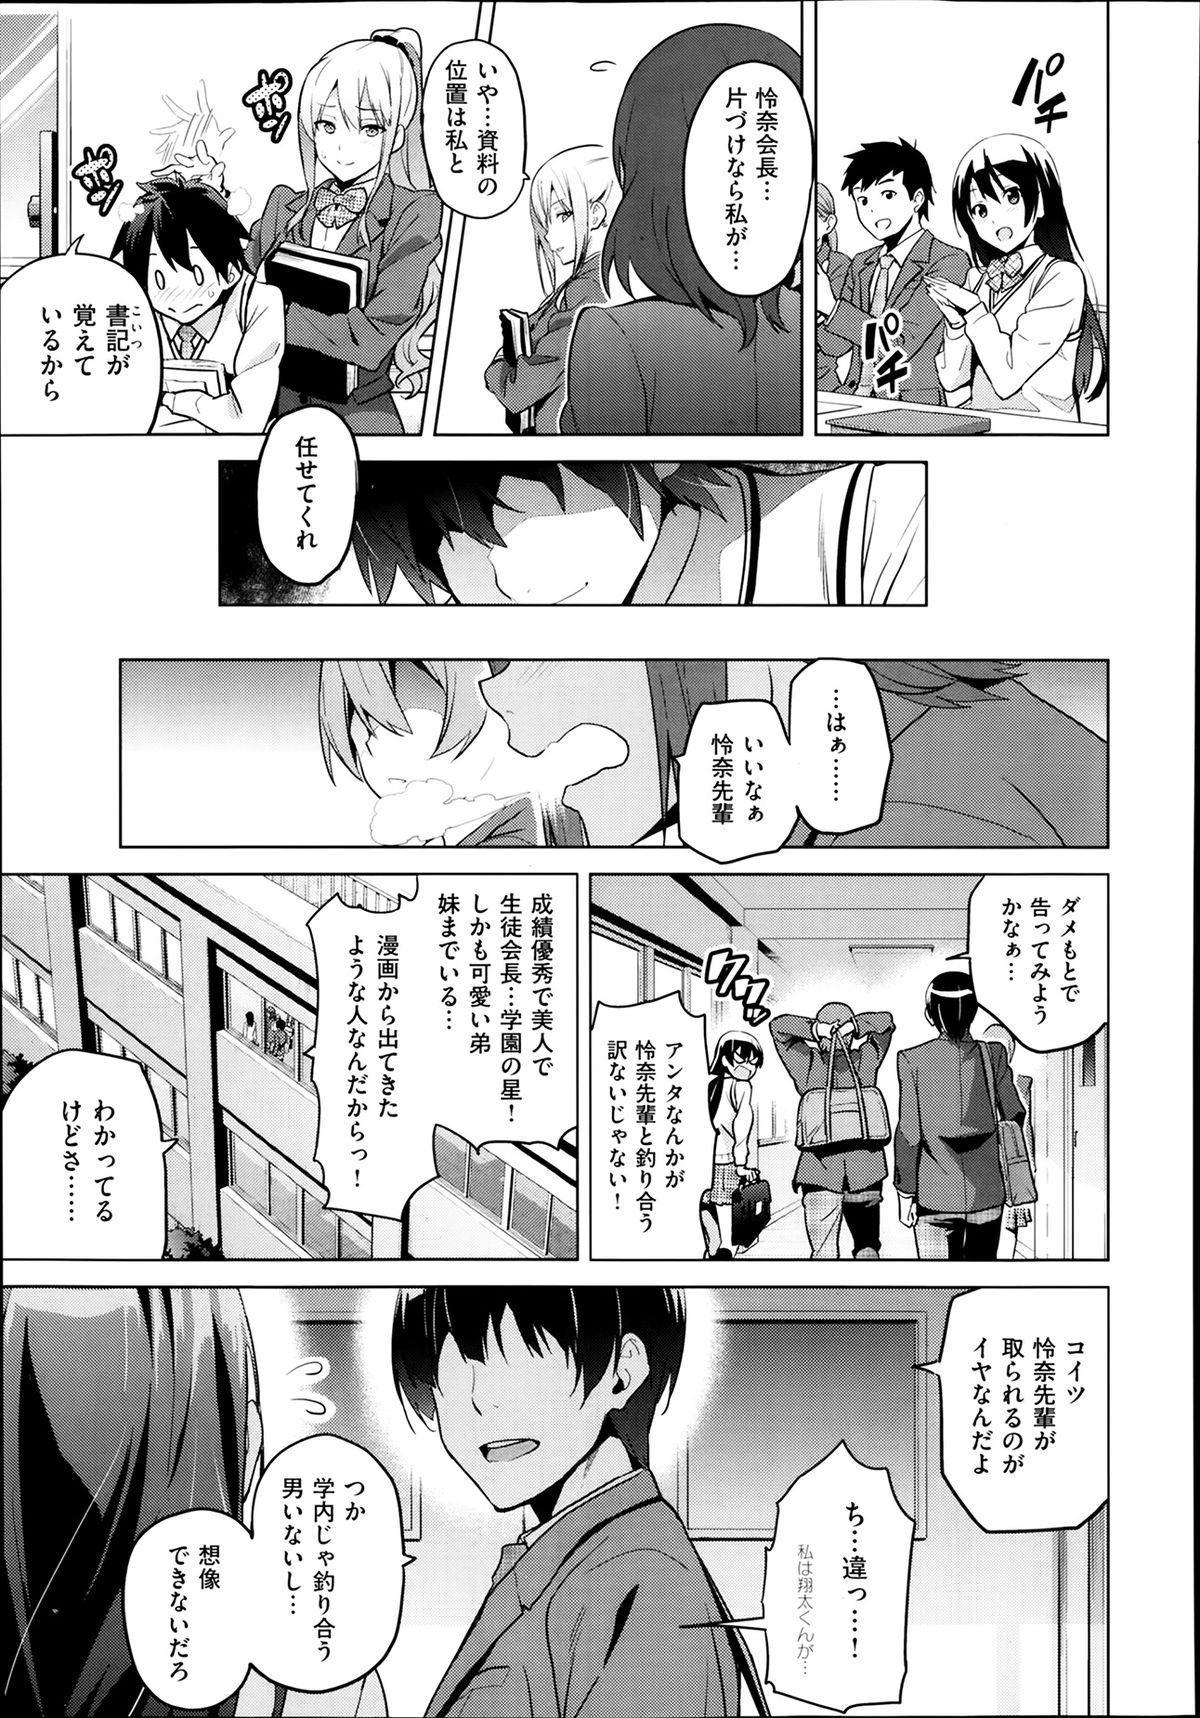 [Takeda Hiromitsu] Sister Breeder ~Oomiya-ke (Ane) no Nayami Goto~ Ch. 1-2 6